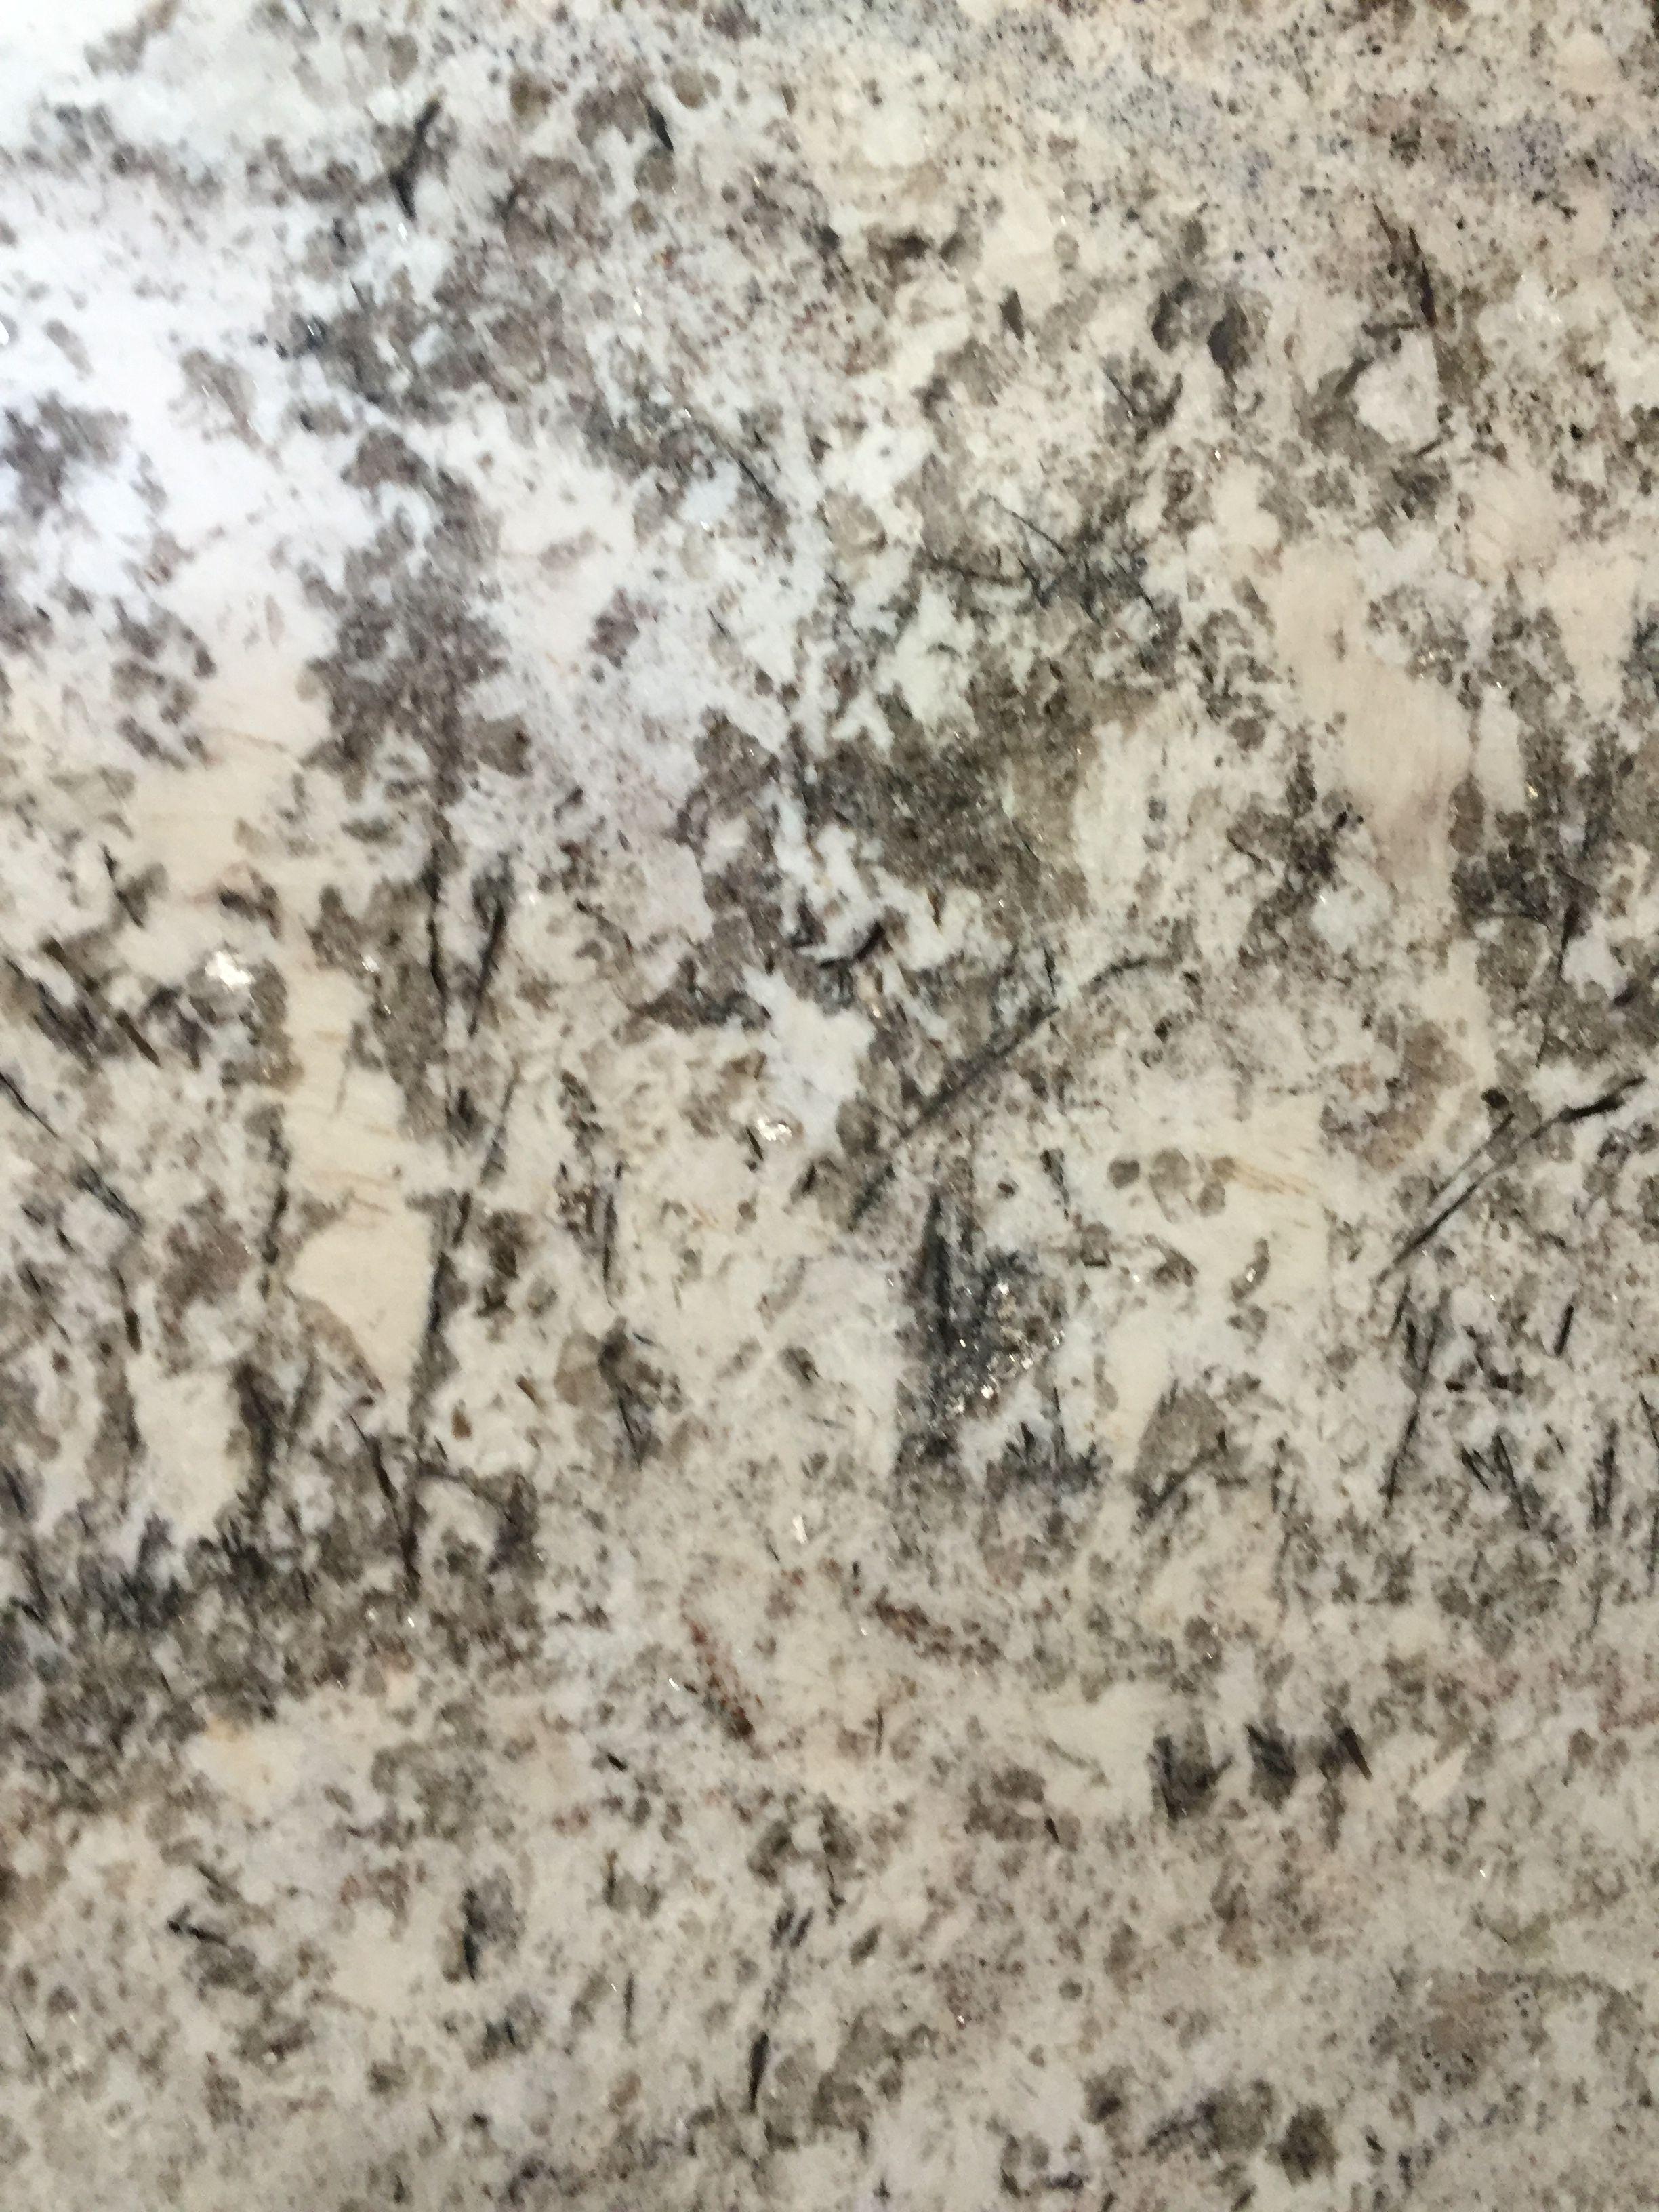 Torroncino White Granite #granite #marble #quartz #countertop #countertops  #granitecountertops #